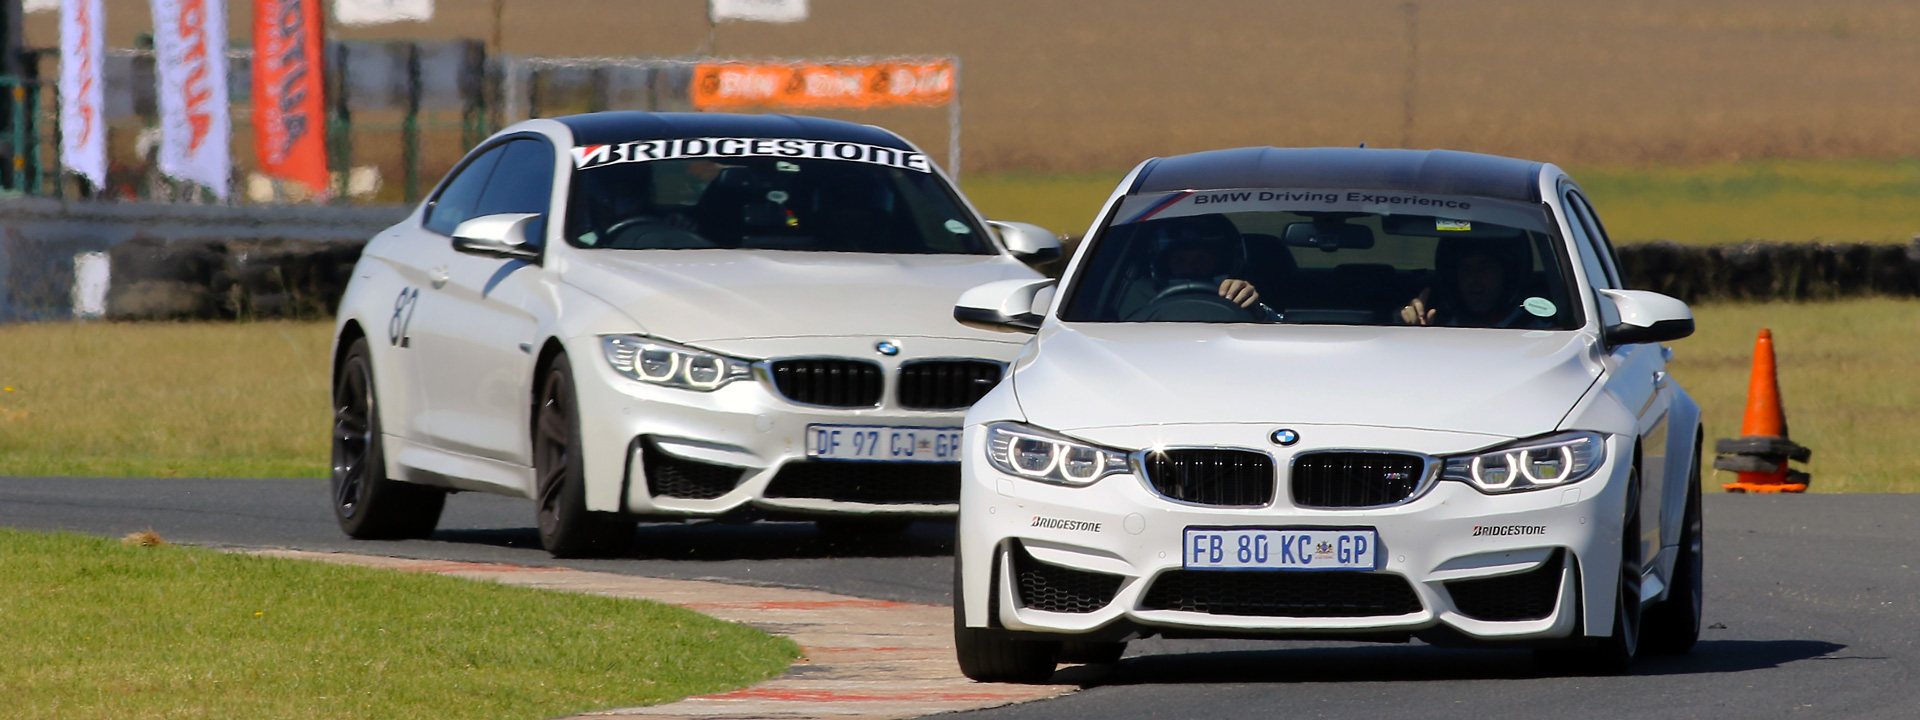 Bridgestone BMW CCG Red Star Raceway Track Day - 16 April 2016 - Photographs